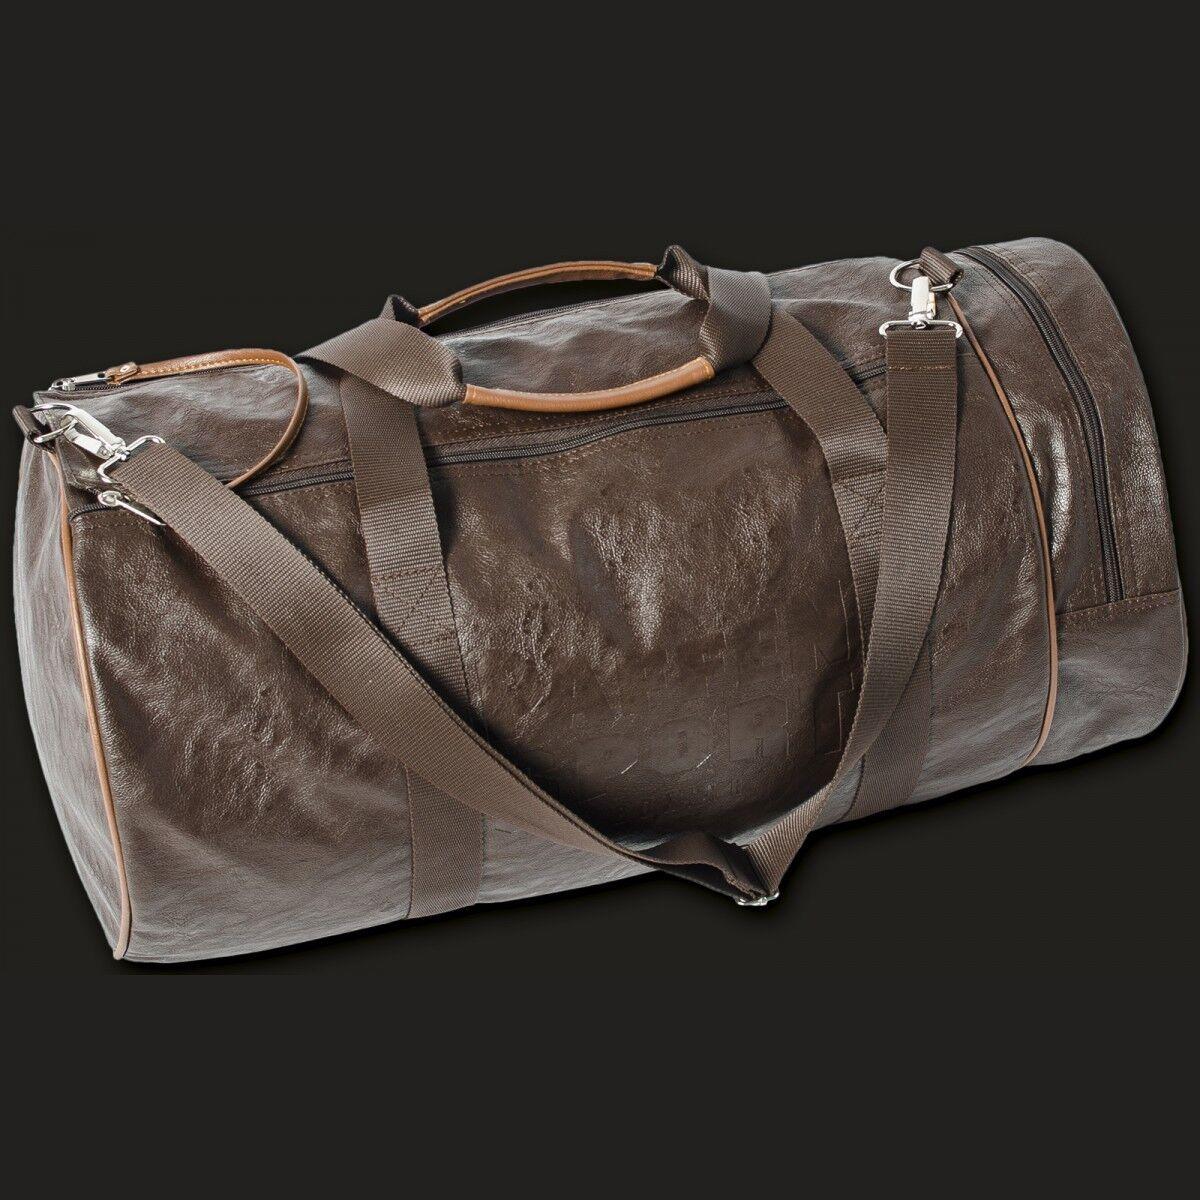 The Greatest Sportbag Von Paffen Sport, Sport, Sport, 60 x 32 cm , zwei Farben, Sport, Boxen, 1236a1